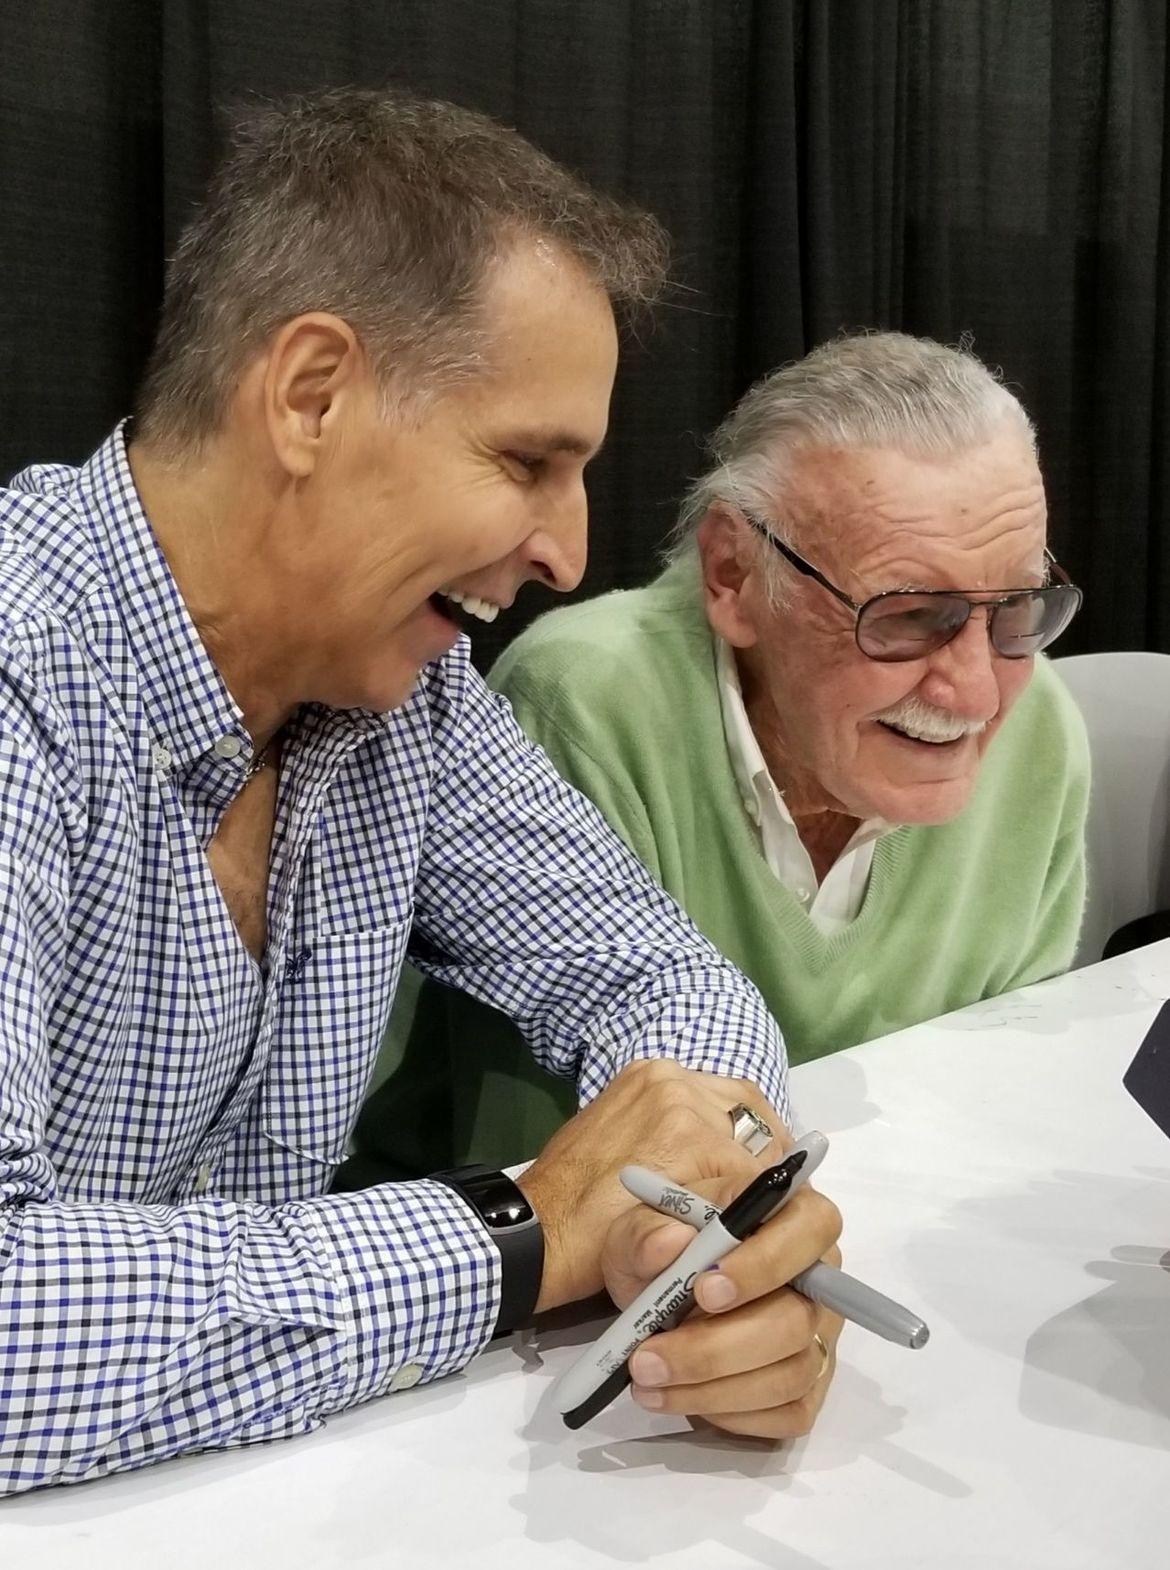 Mcfarlane Stan Lee smiling